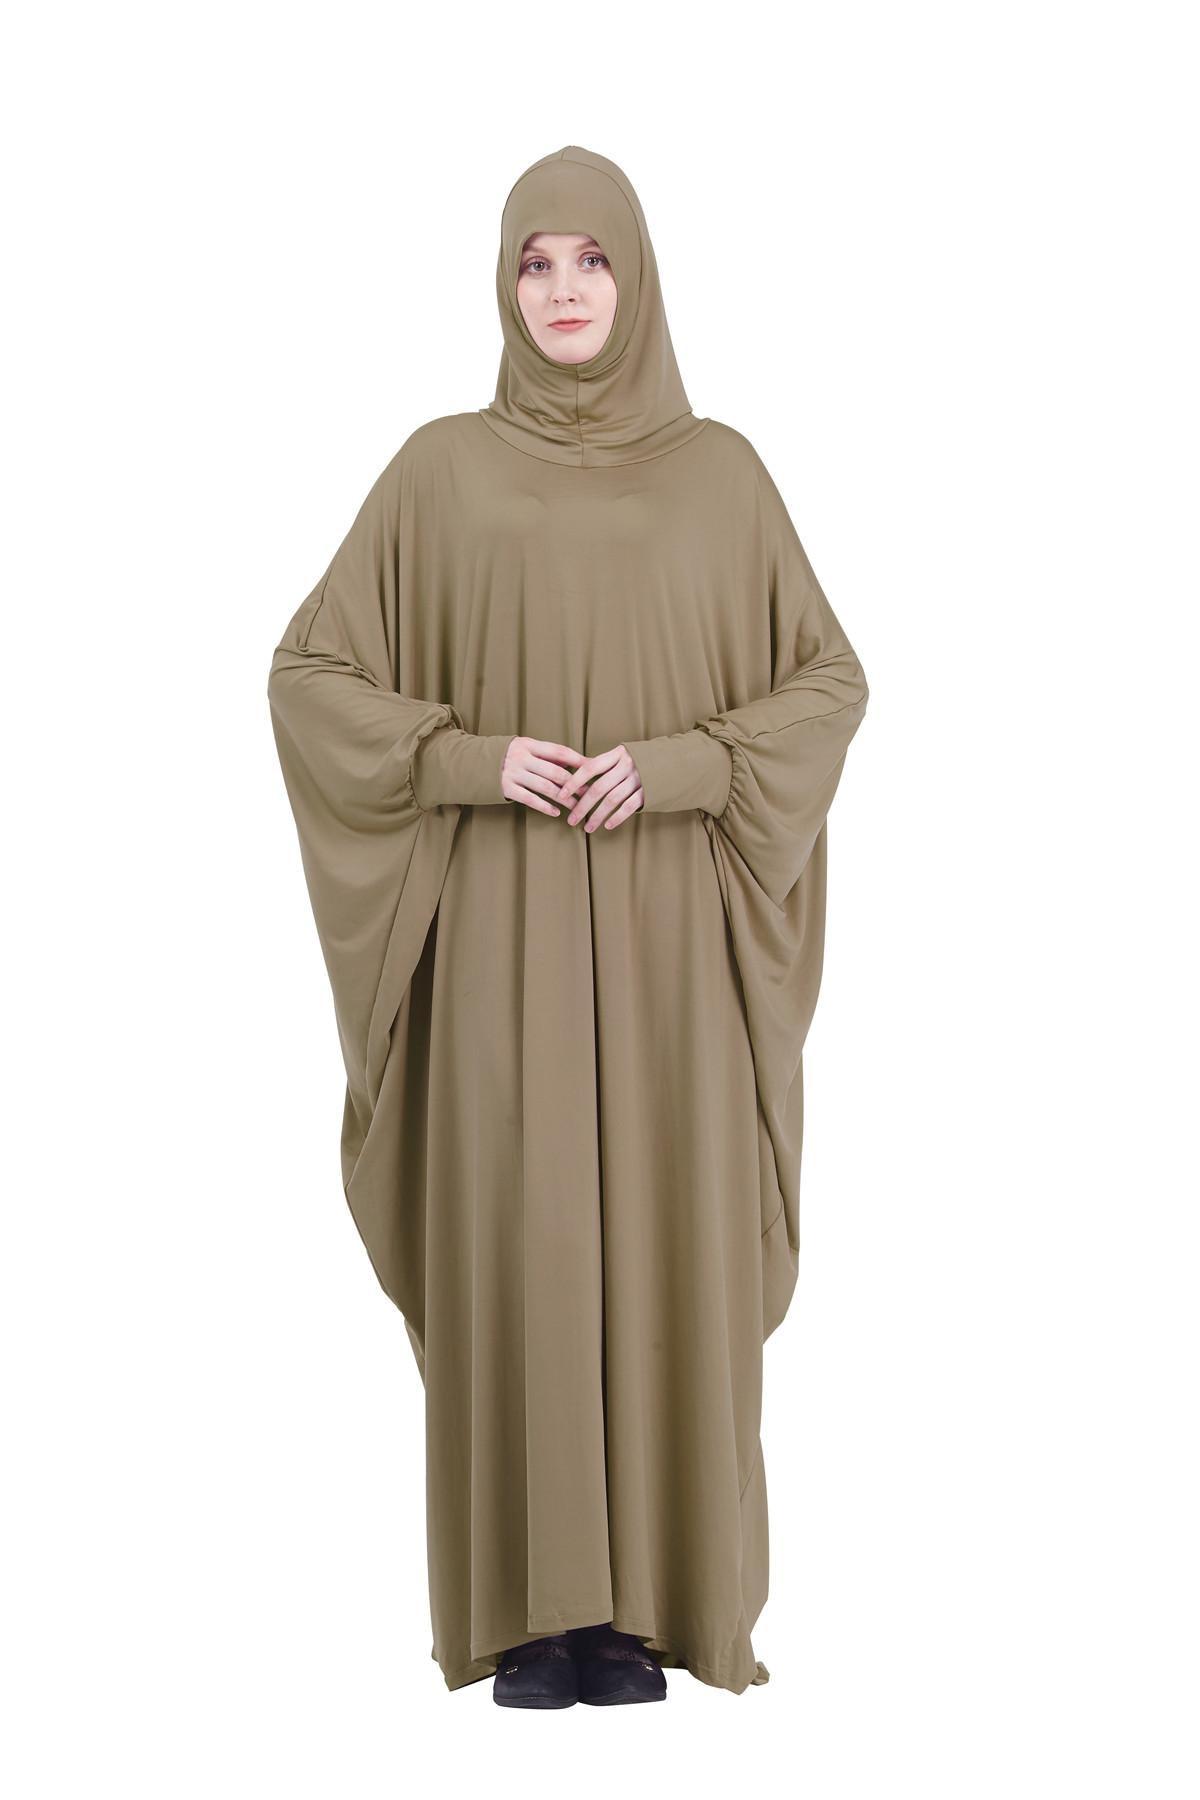 Muslim Women Full Cover Hooded Abaya Long Maxi Dress Islam Prayer Robe Kaftan Jilbab Arabic Ramadan Solid Color Worship Service